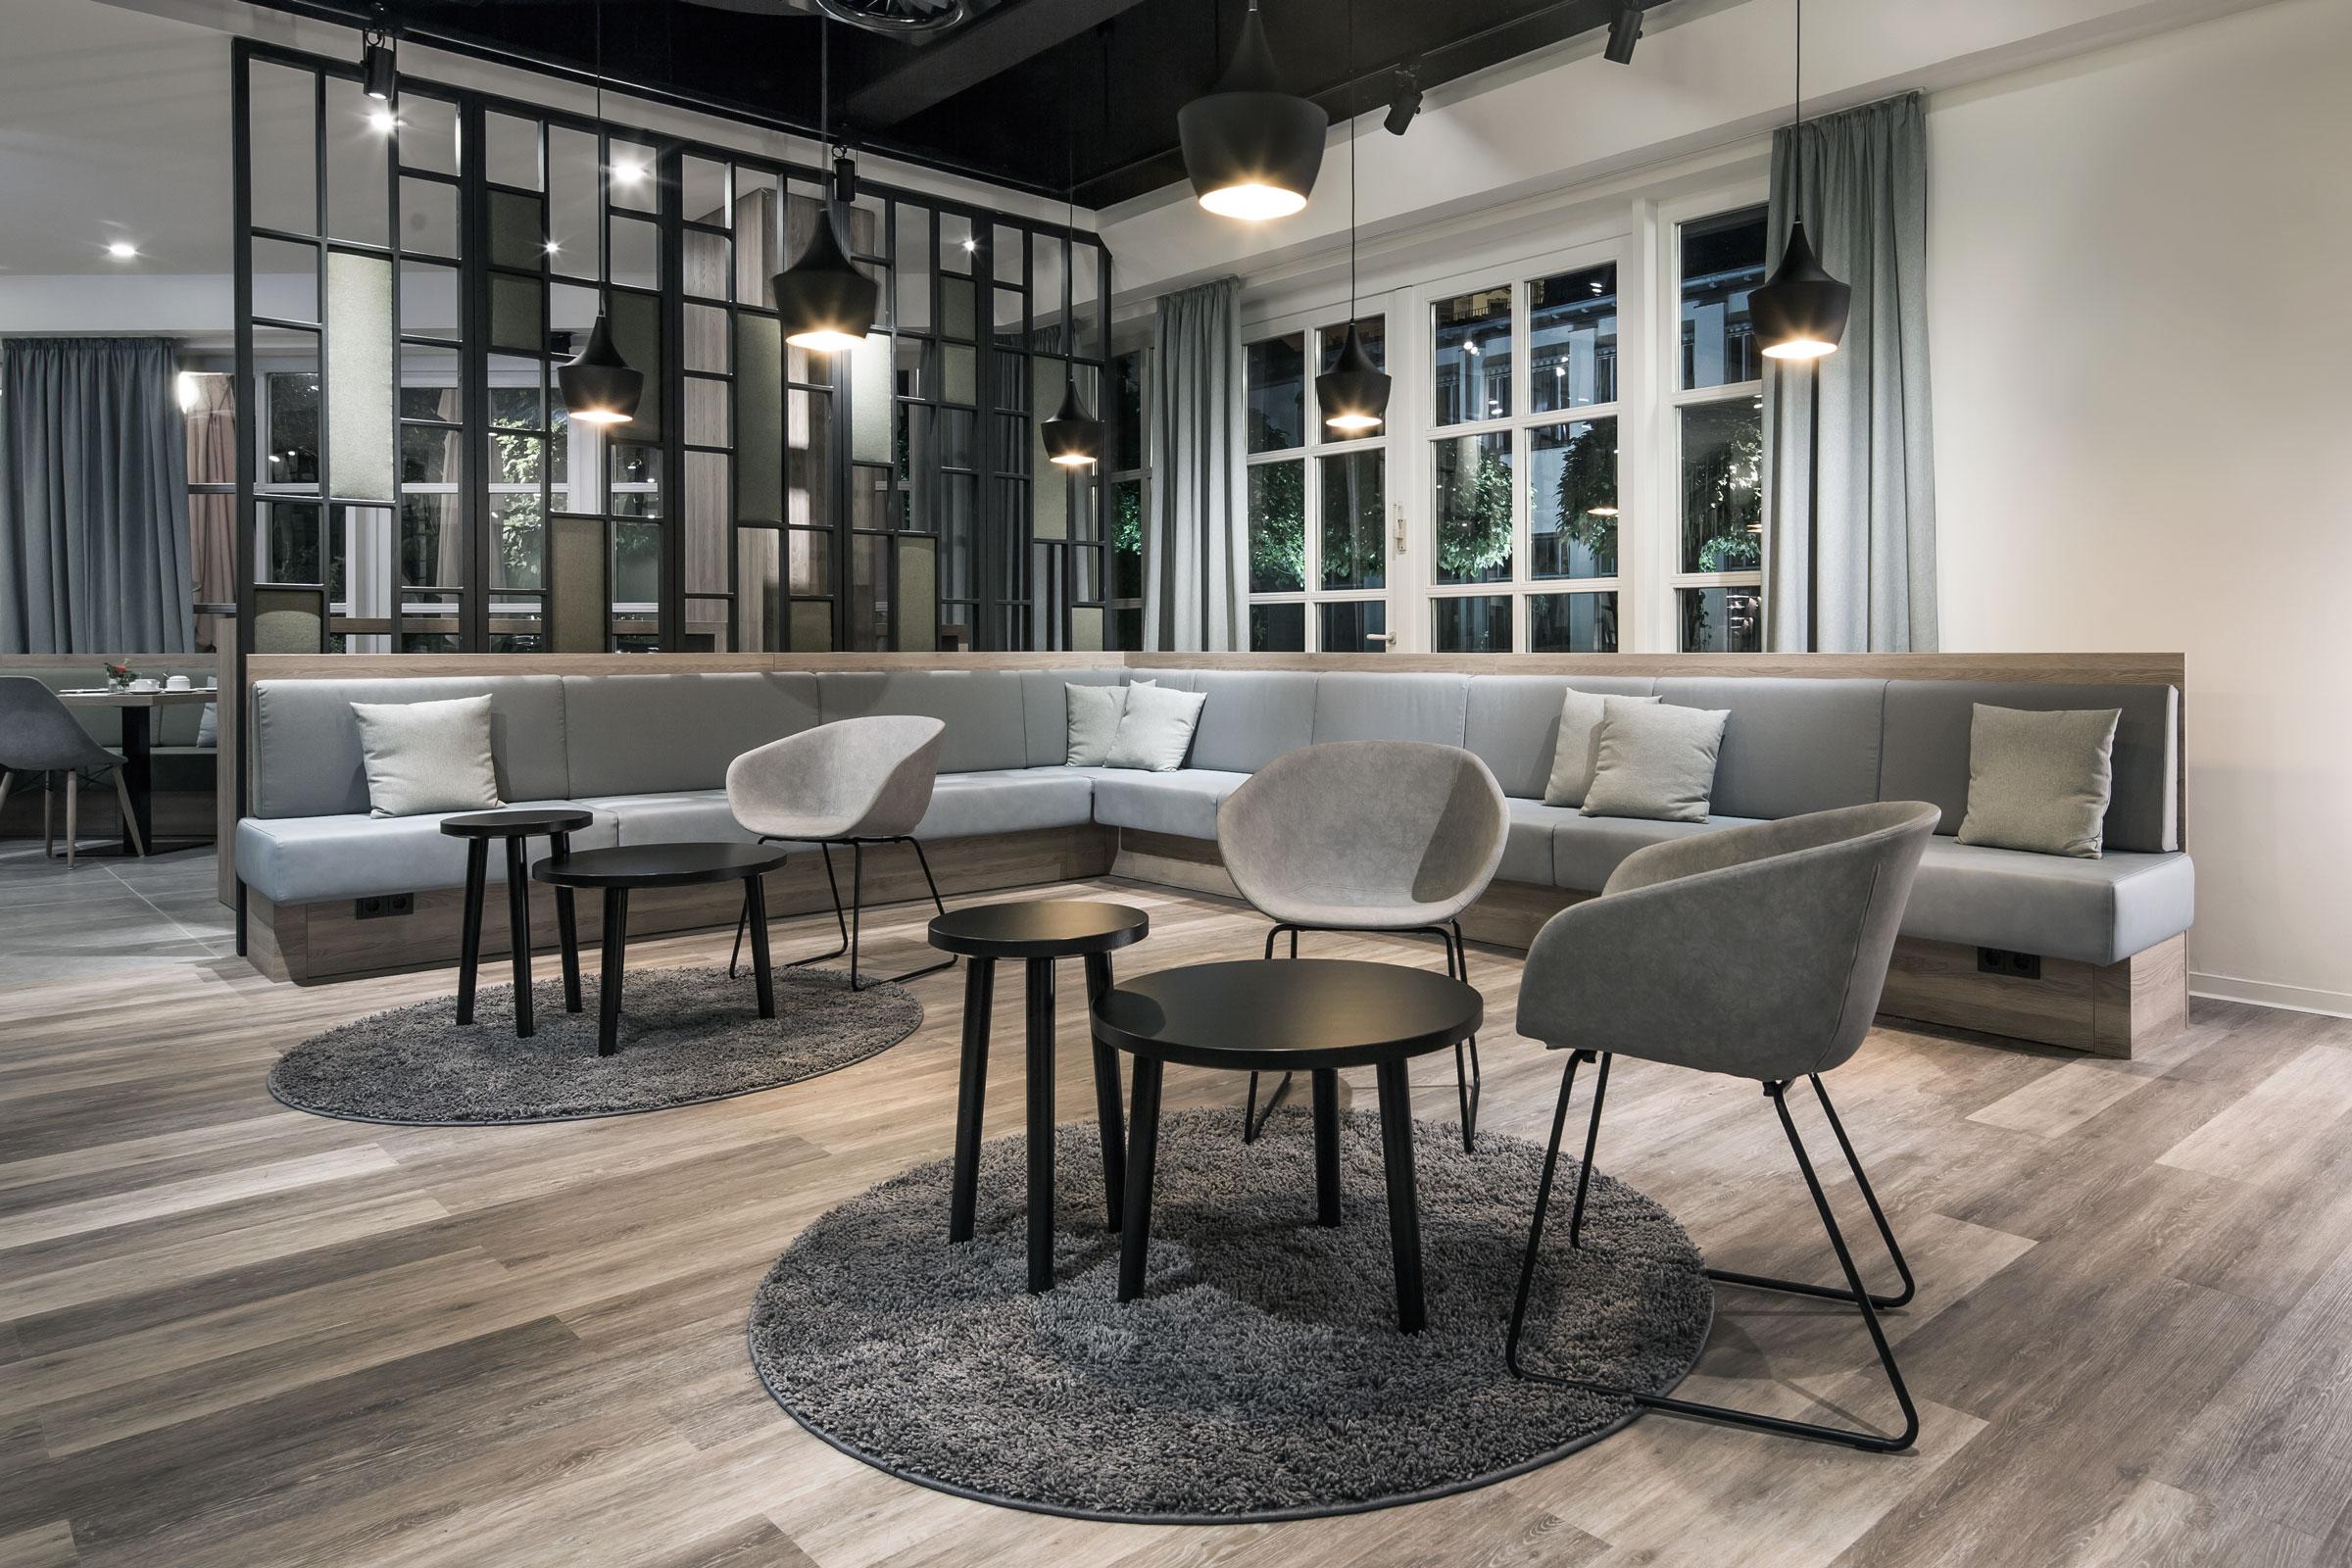 nestor hotel neckarsulm dia dittel architekten. Black Bedroom Furniture Sets. Home Design Ideas